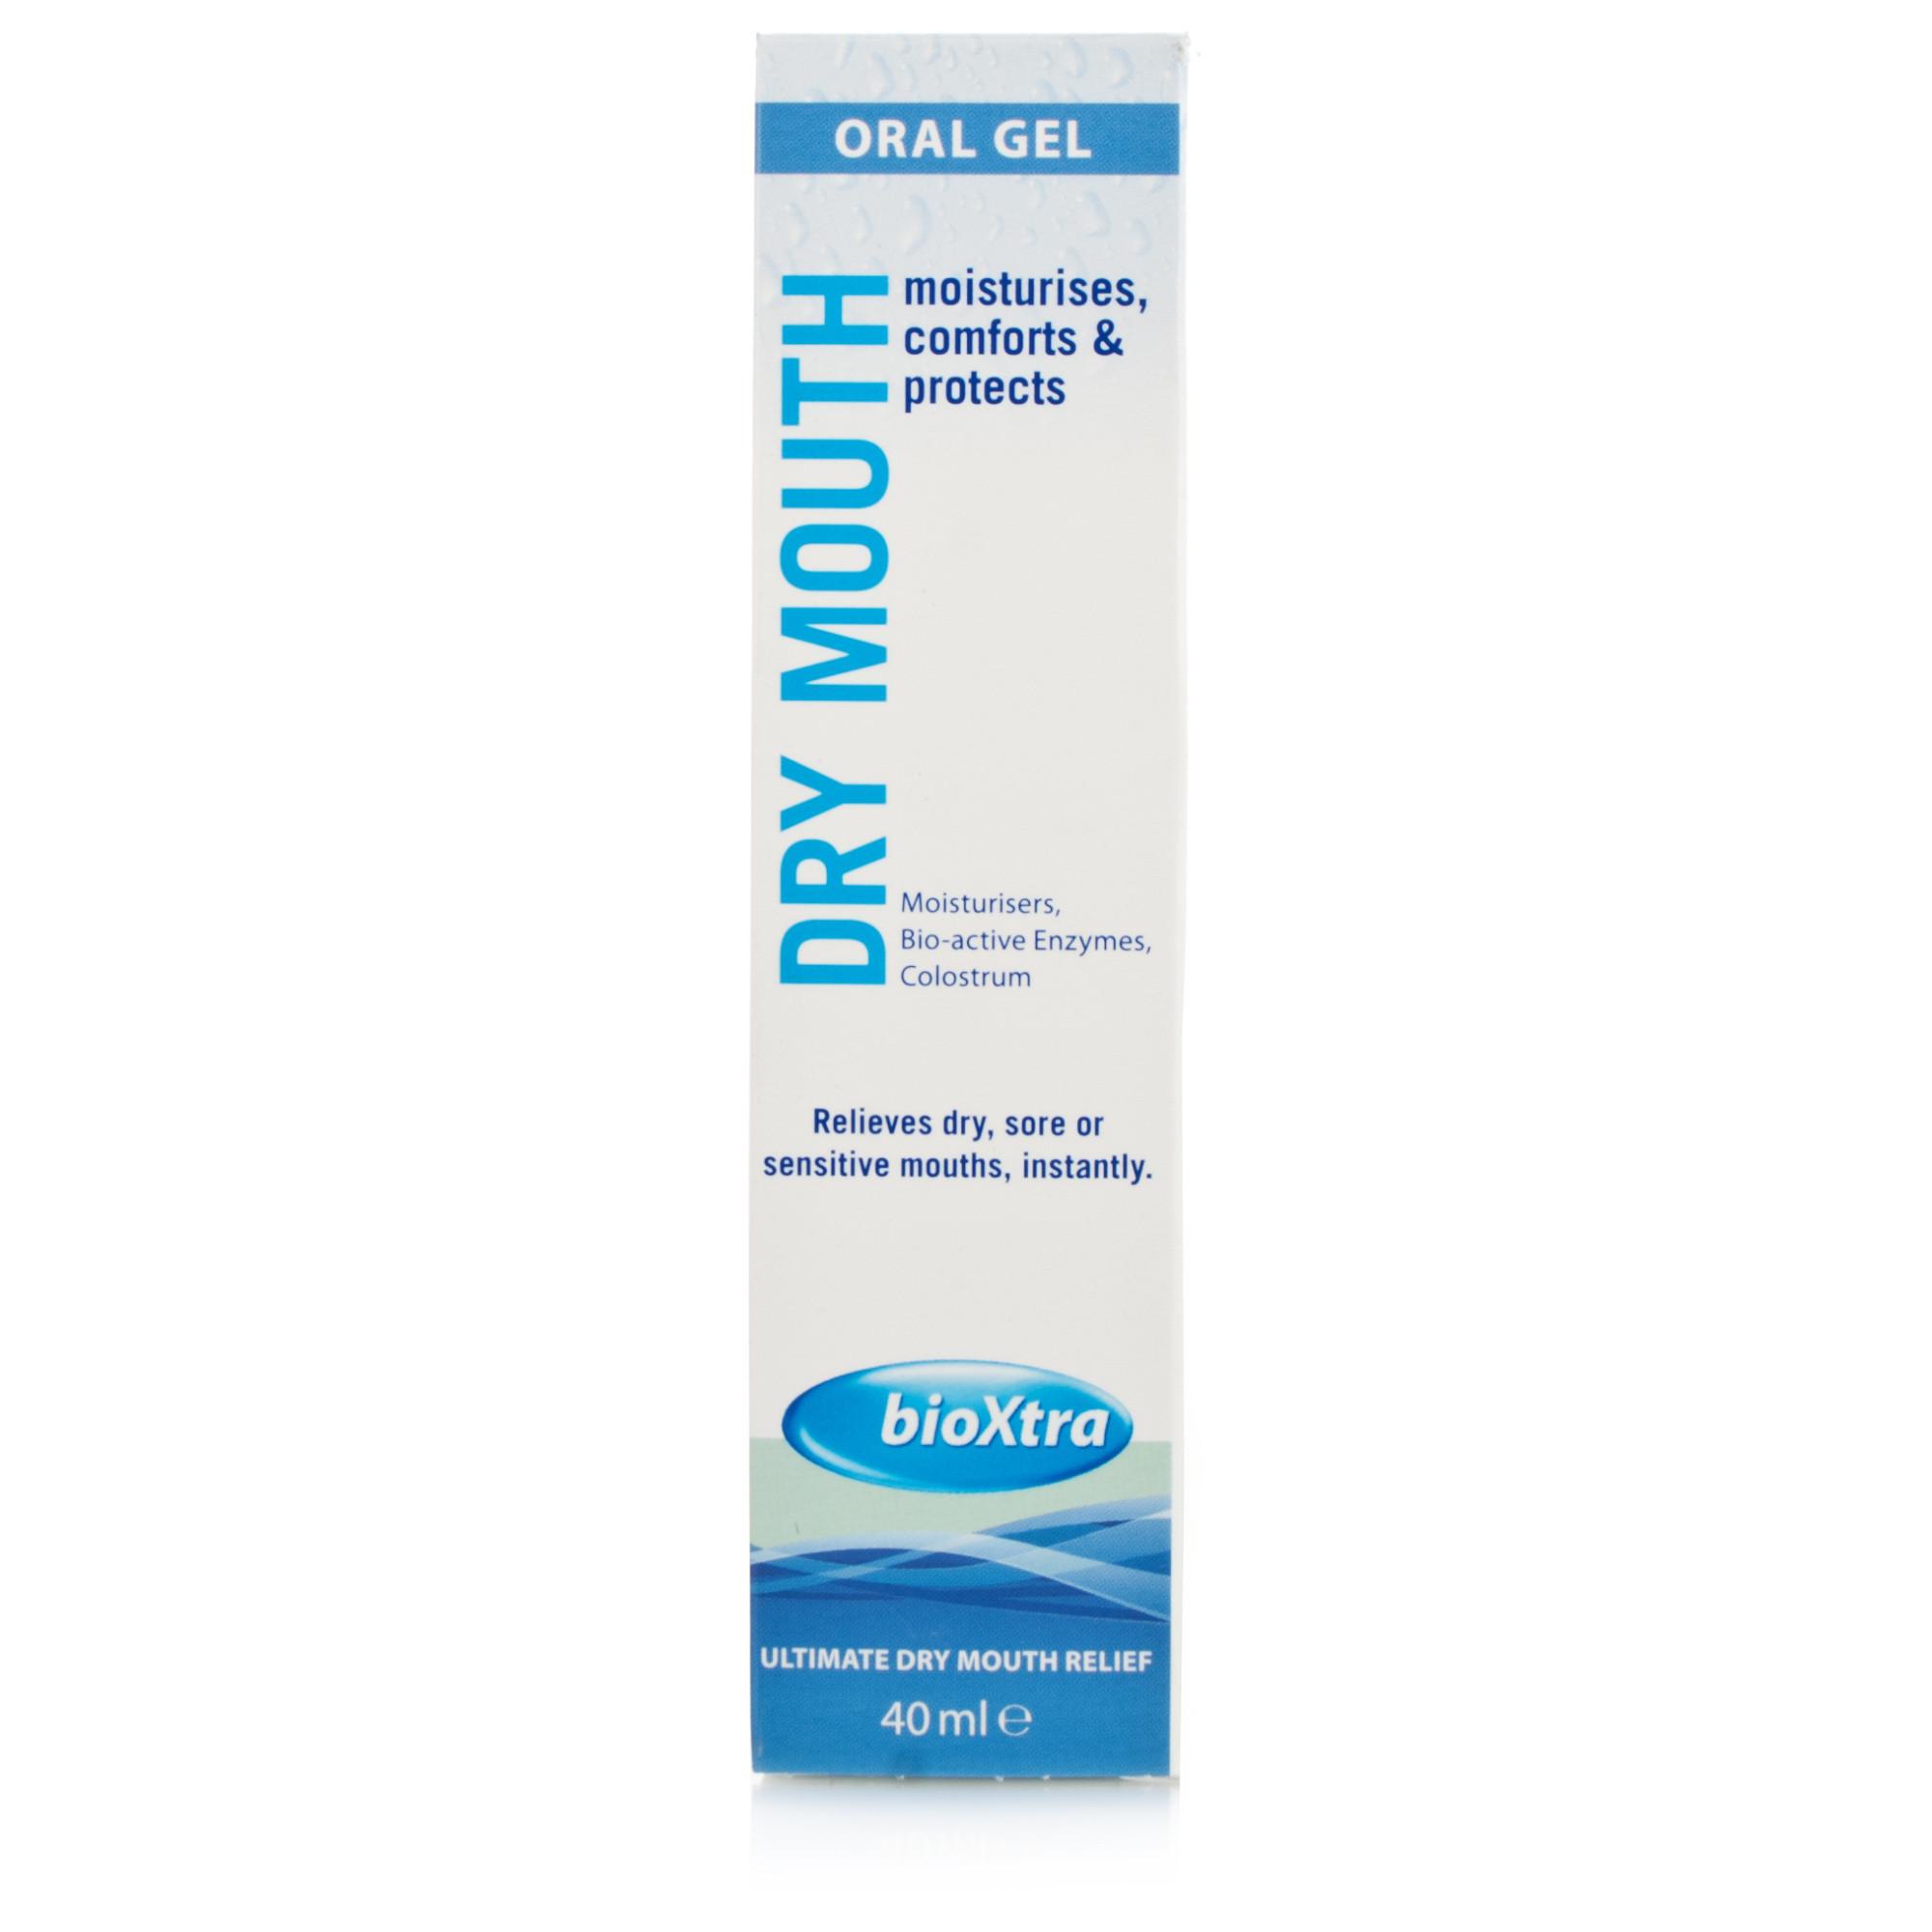 Bioxtra Dry Mouth Gel